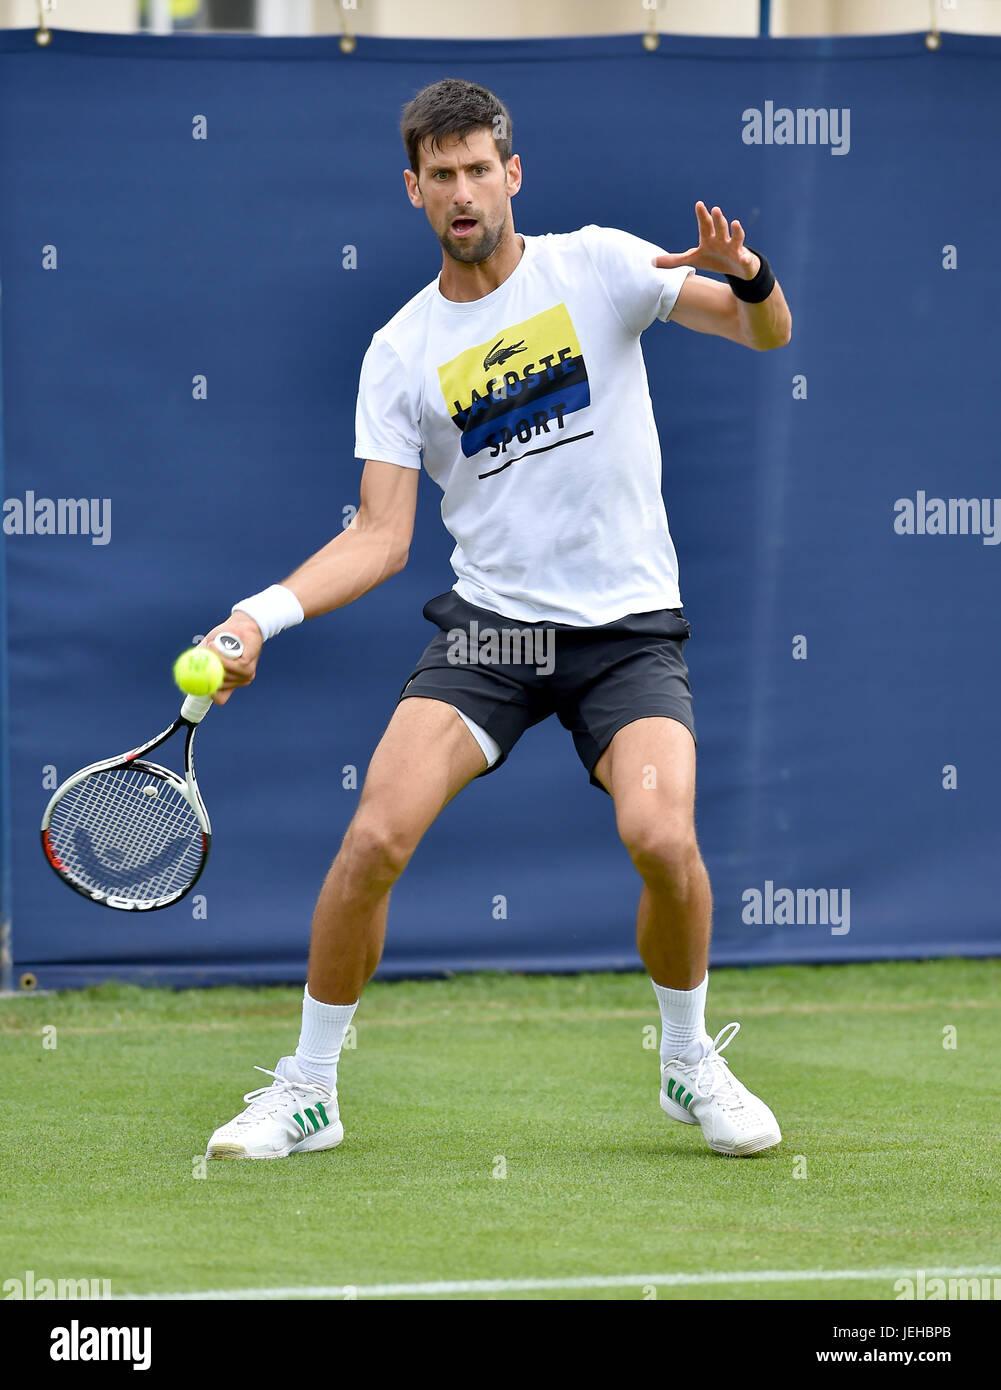 Novac Djokovic practicing at the Aegon International tennis tournament at Devonshire Park in Eastbourne East Sussex UK. 25 Jun 2017 Stock Photo